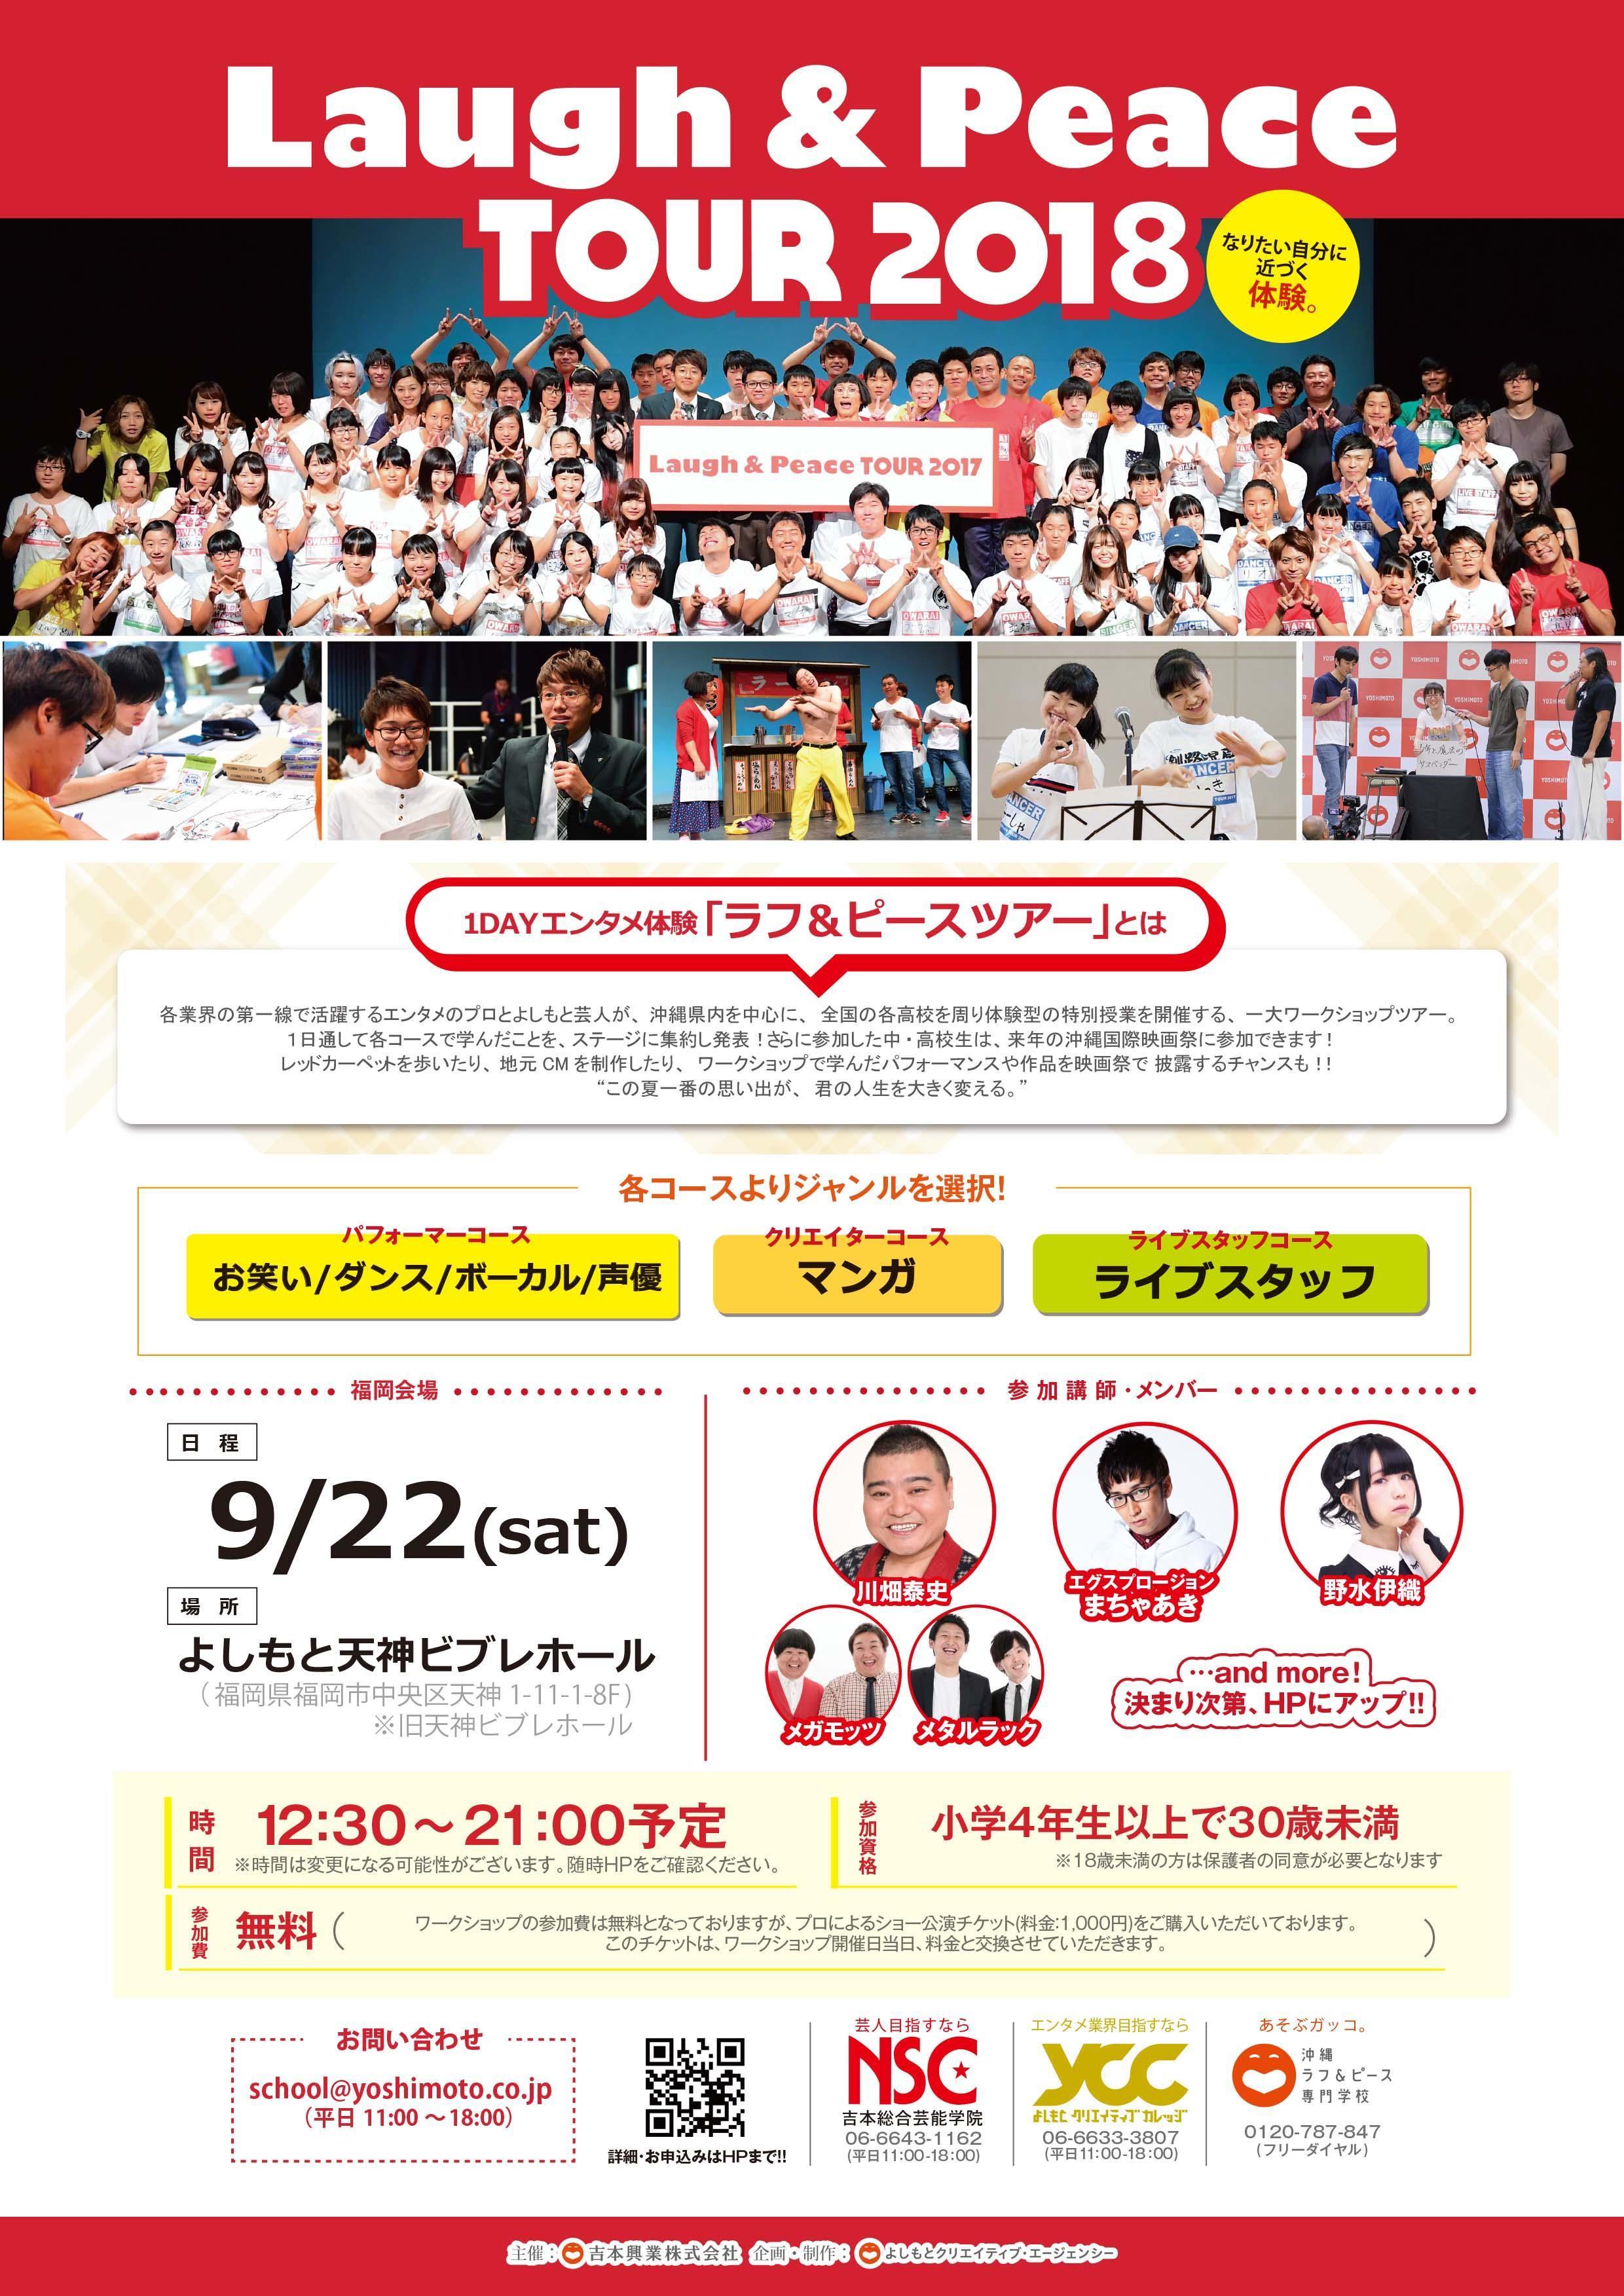 http://news.yoshimoto.co.jp/20180807153929-bf8b3d5521549cf92777e43118c3ab5753ff1900.jpg